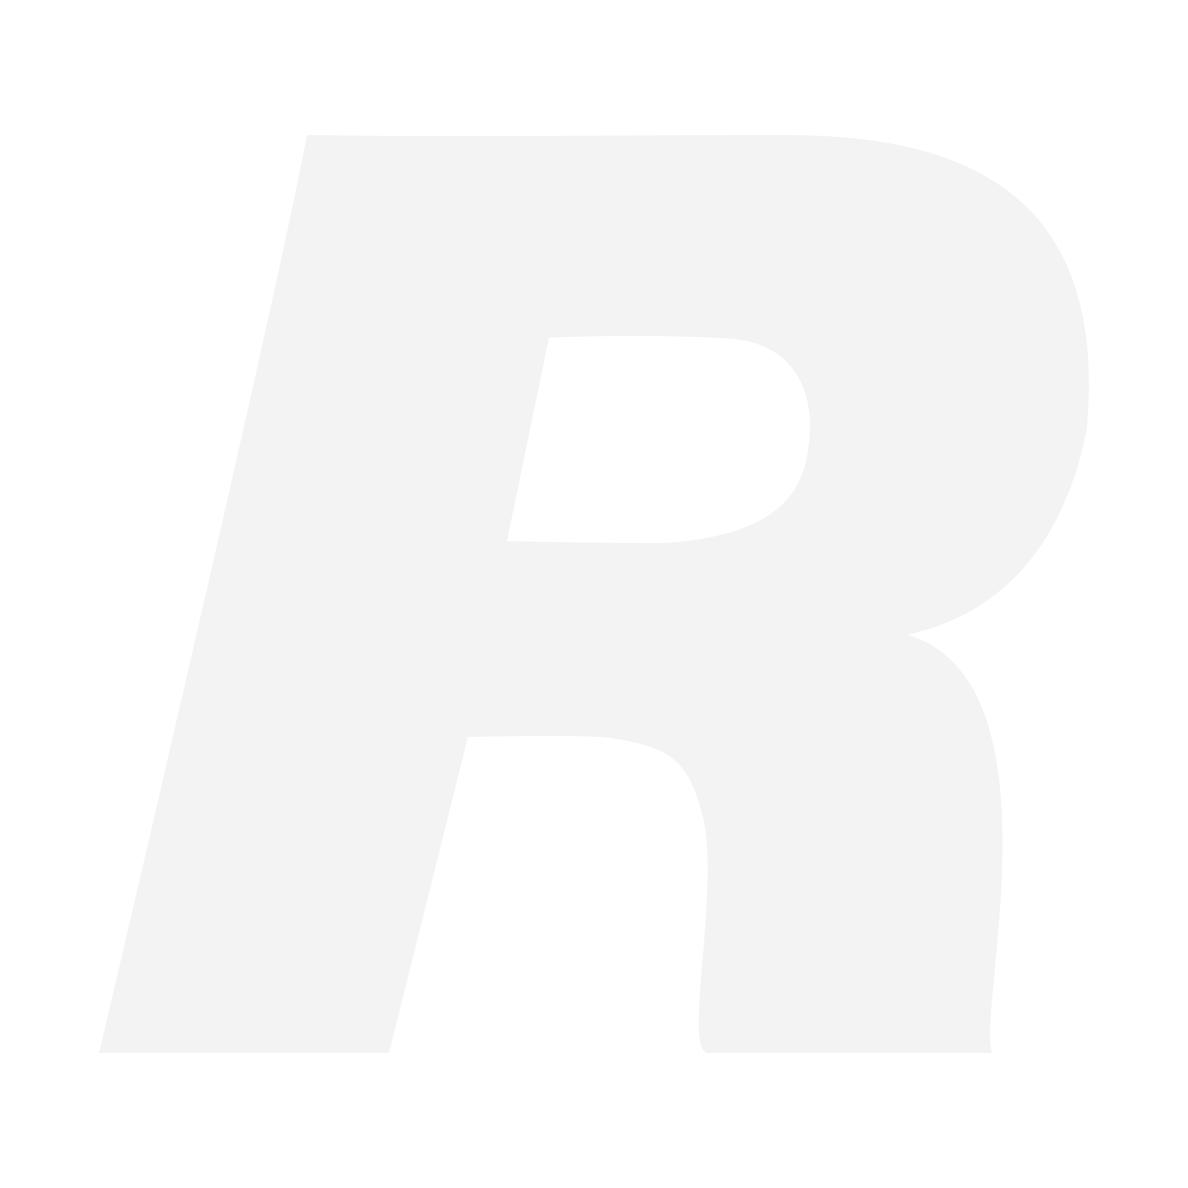 Sony Trådlös fjärrkontroll RMT-DSLR2